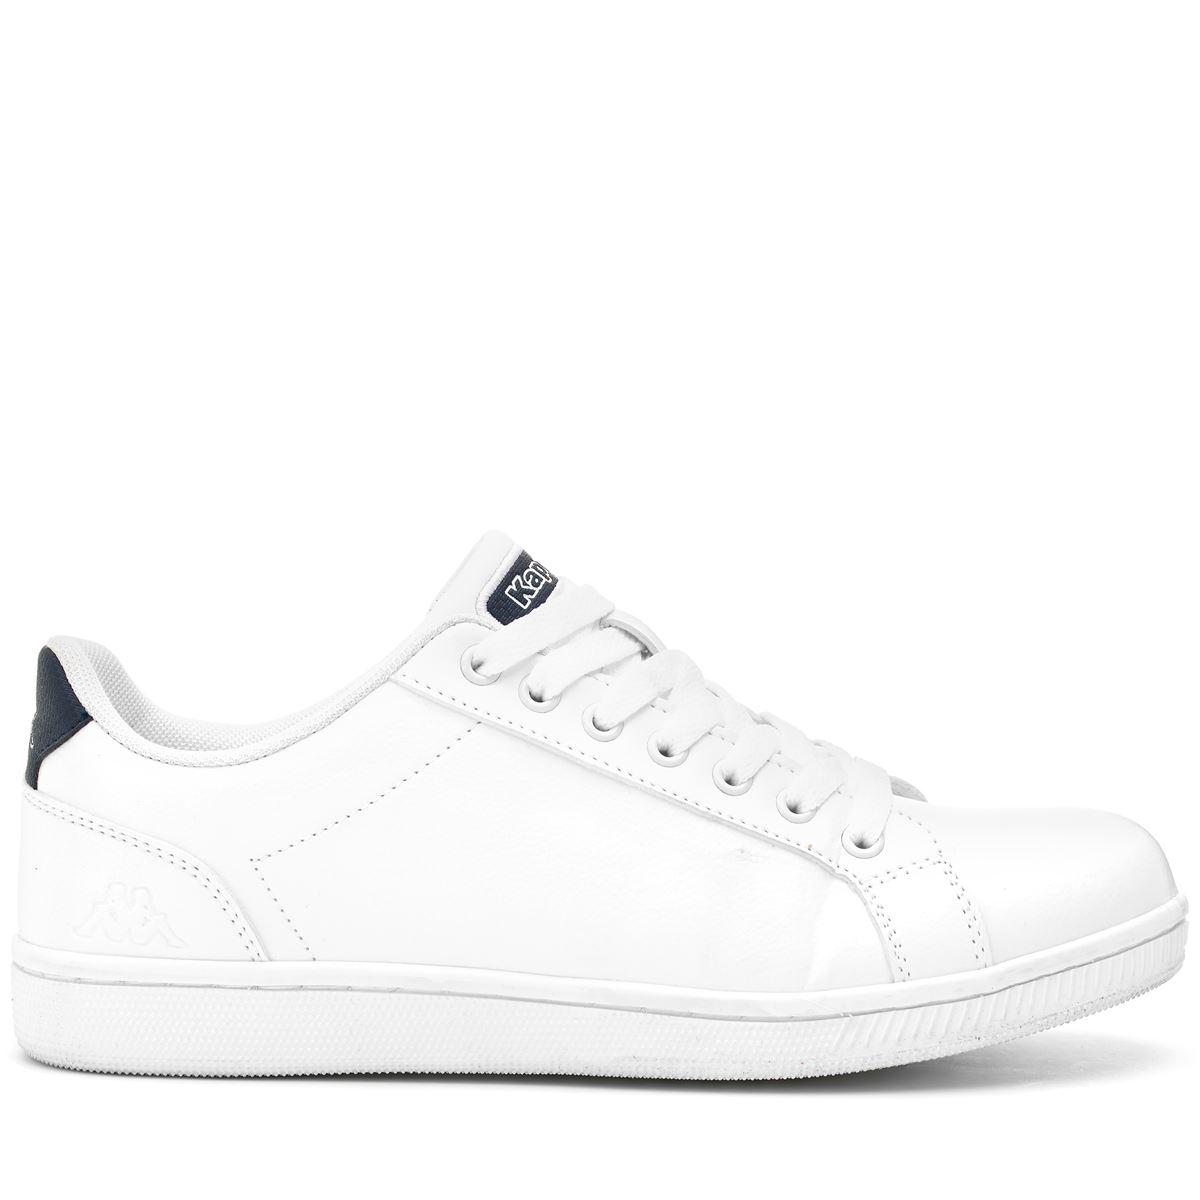 Kappa-Scarpe-Sneakers-Uomo-Donna-LOGO-GALTER-5-Camminata-Basso miniatuur 6